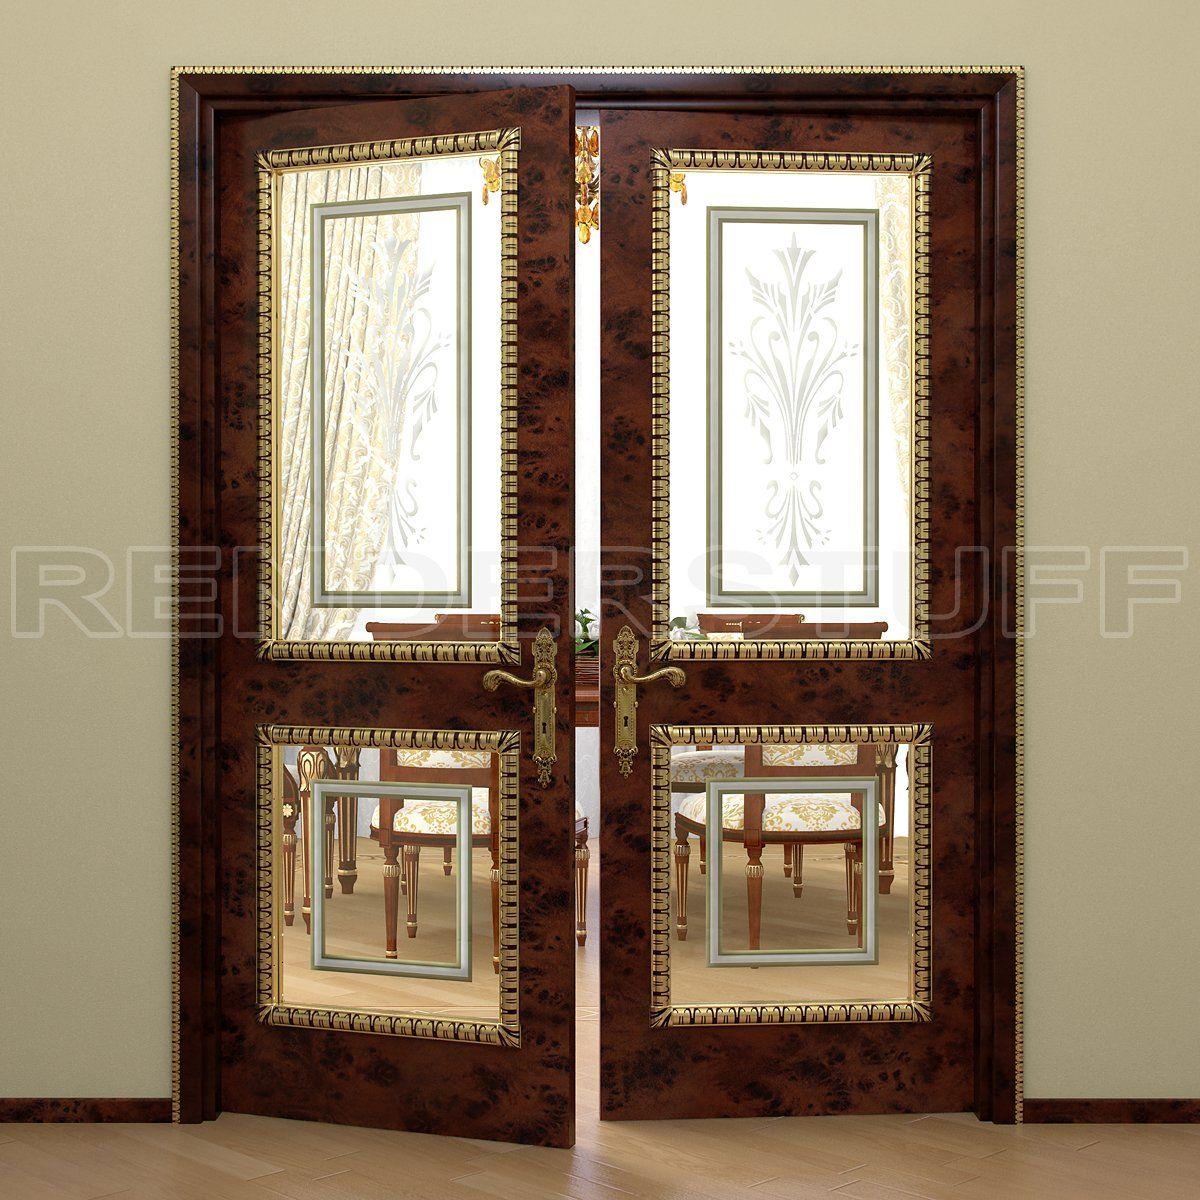 Ornate Doors | Decorative Glass For A Beautiful Home Interior Photos 447  Decorative .